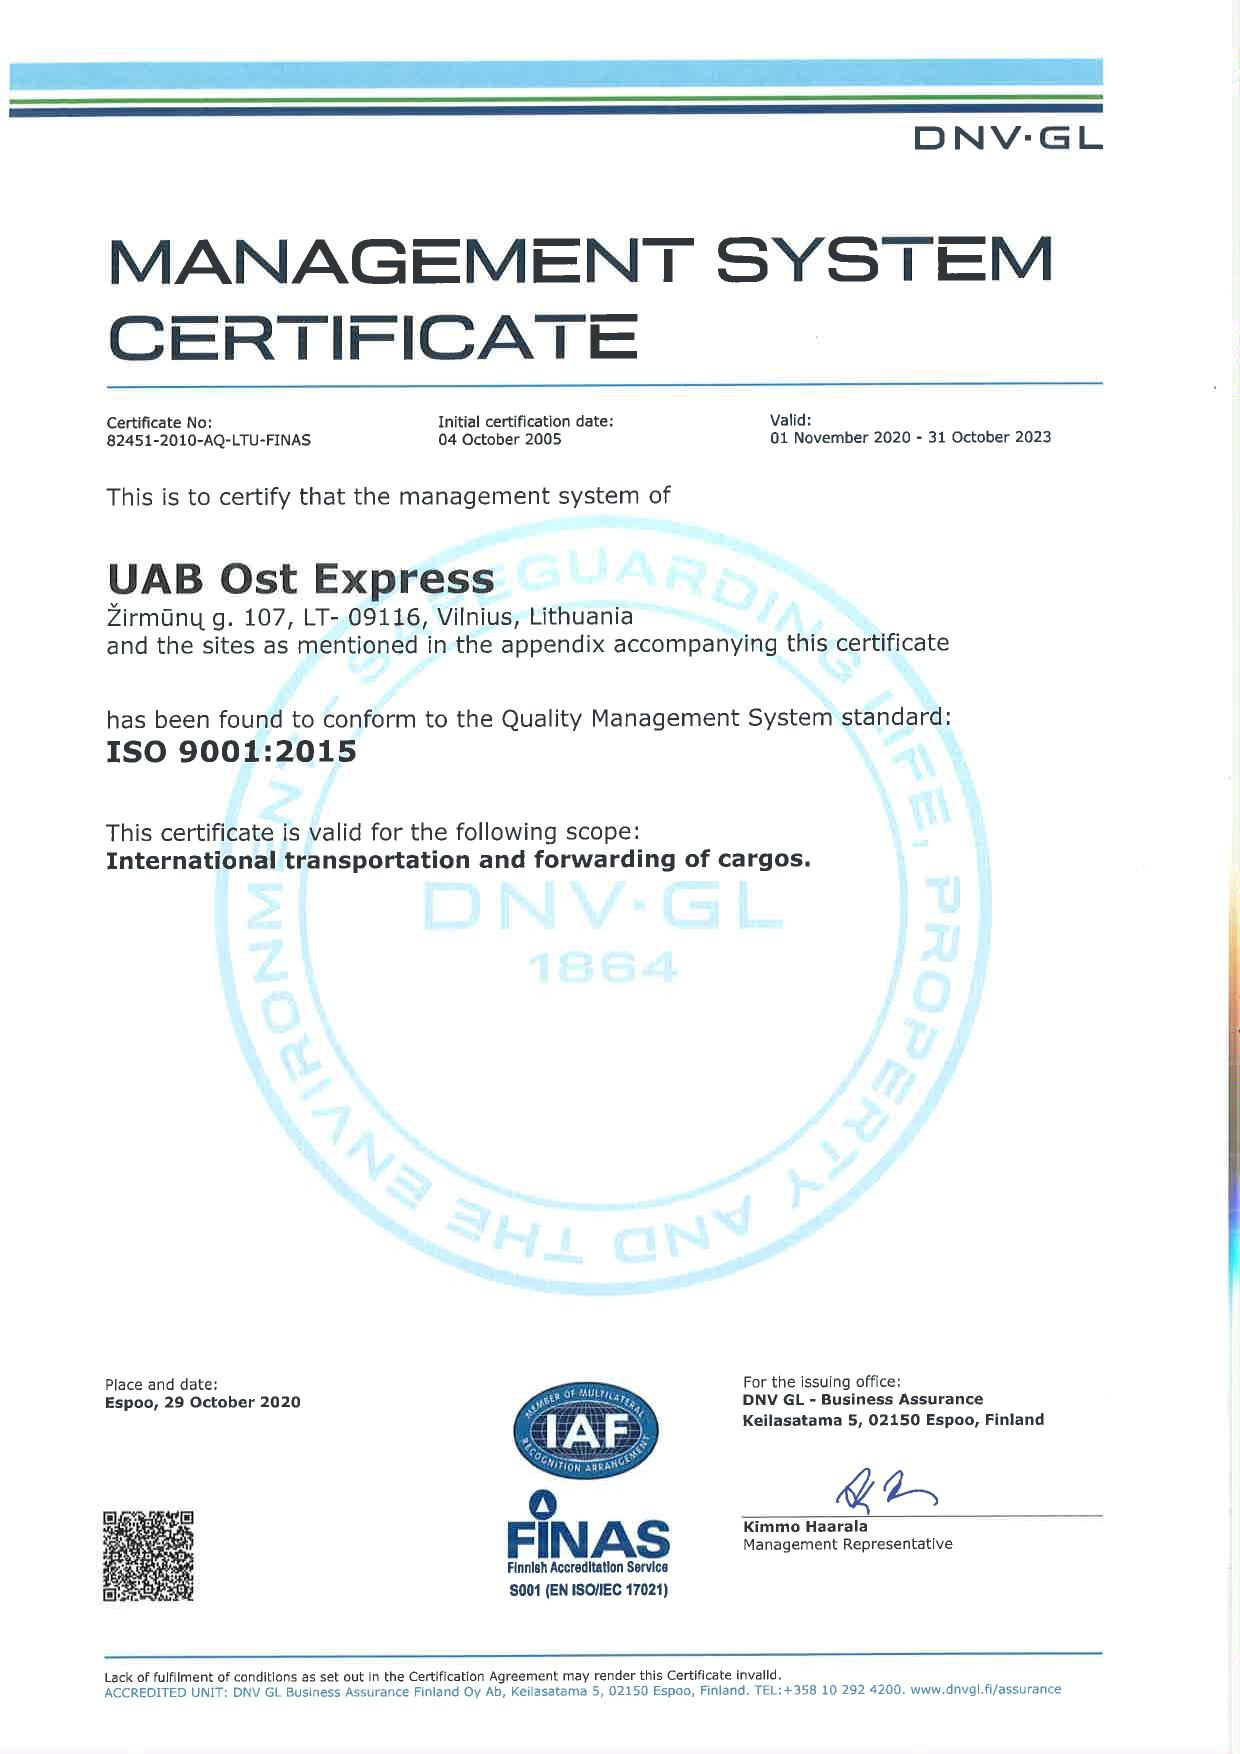 ISO 9001:2008 SERTIFIKATAS OST EXPRESS